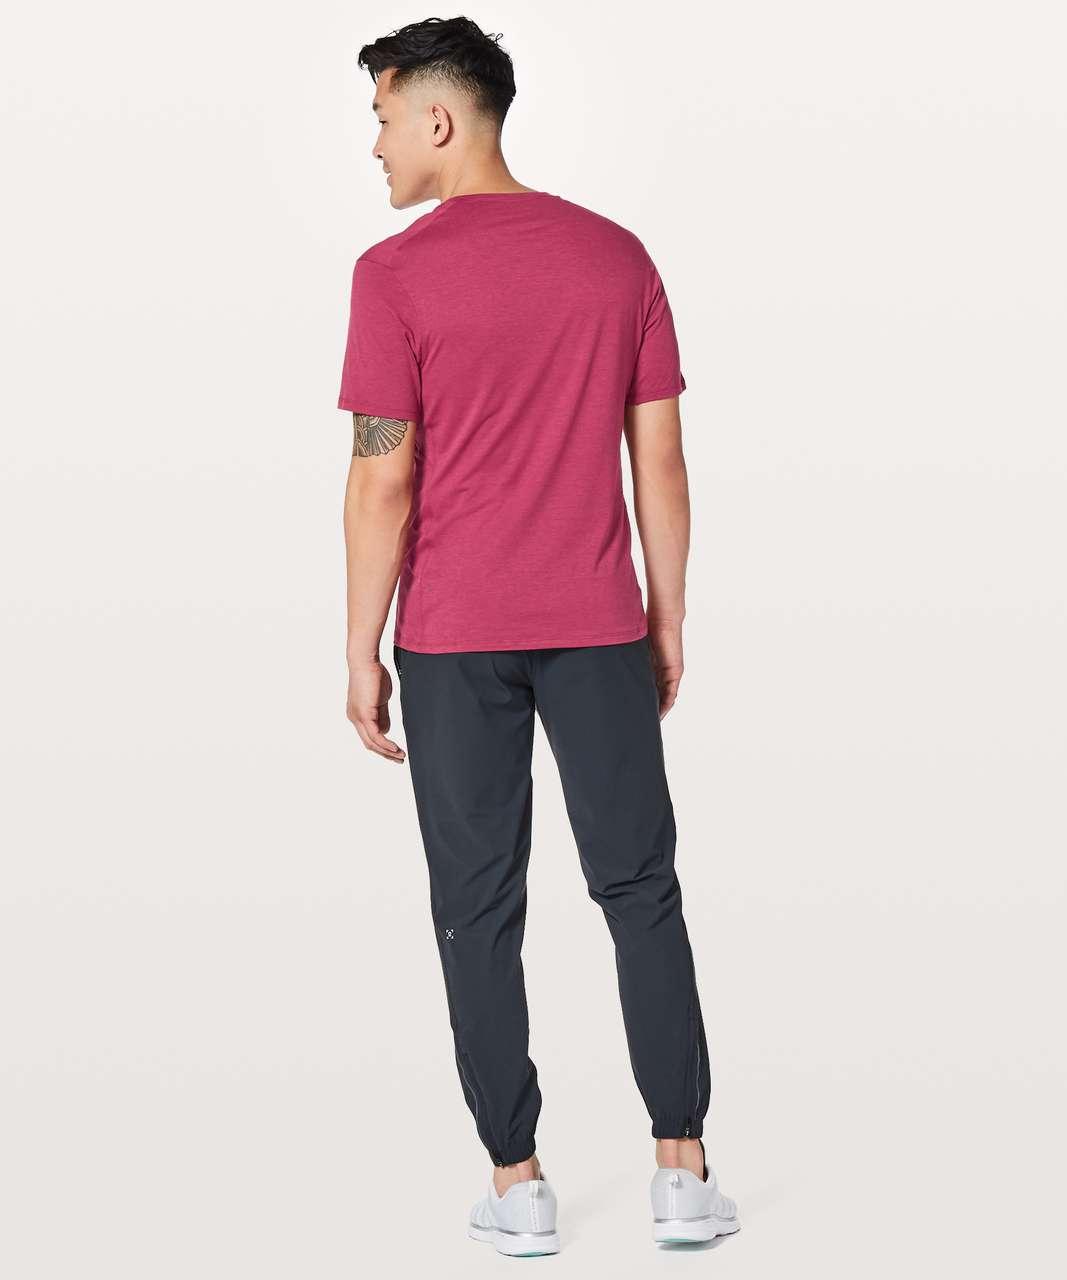 Lululemon Somatic Aero Short Sleeve - Violet Red